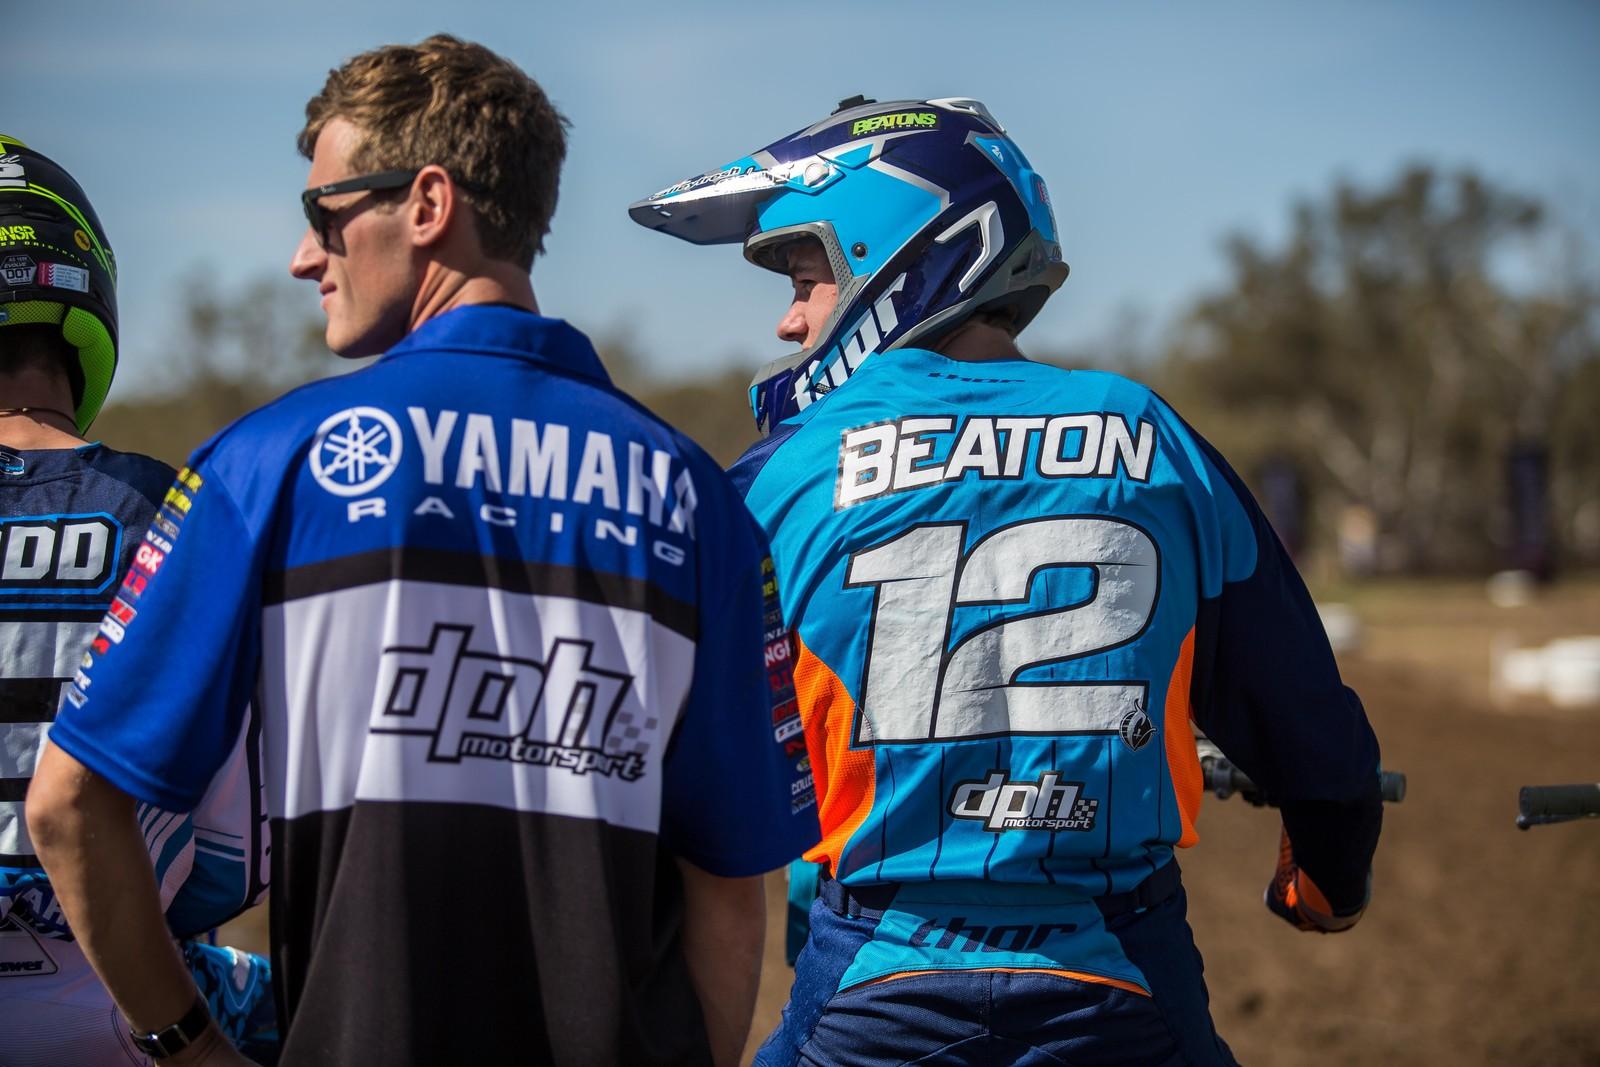 Jed Beaton - Australian Motul Motocross Nationals Round. 1, Horsham - Motocross Pictures - Vital MX